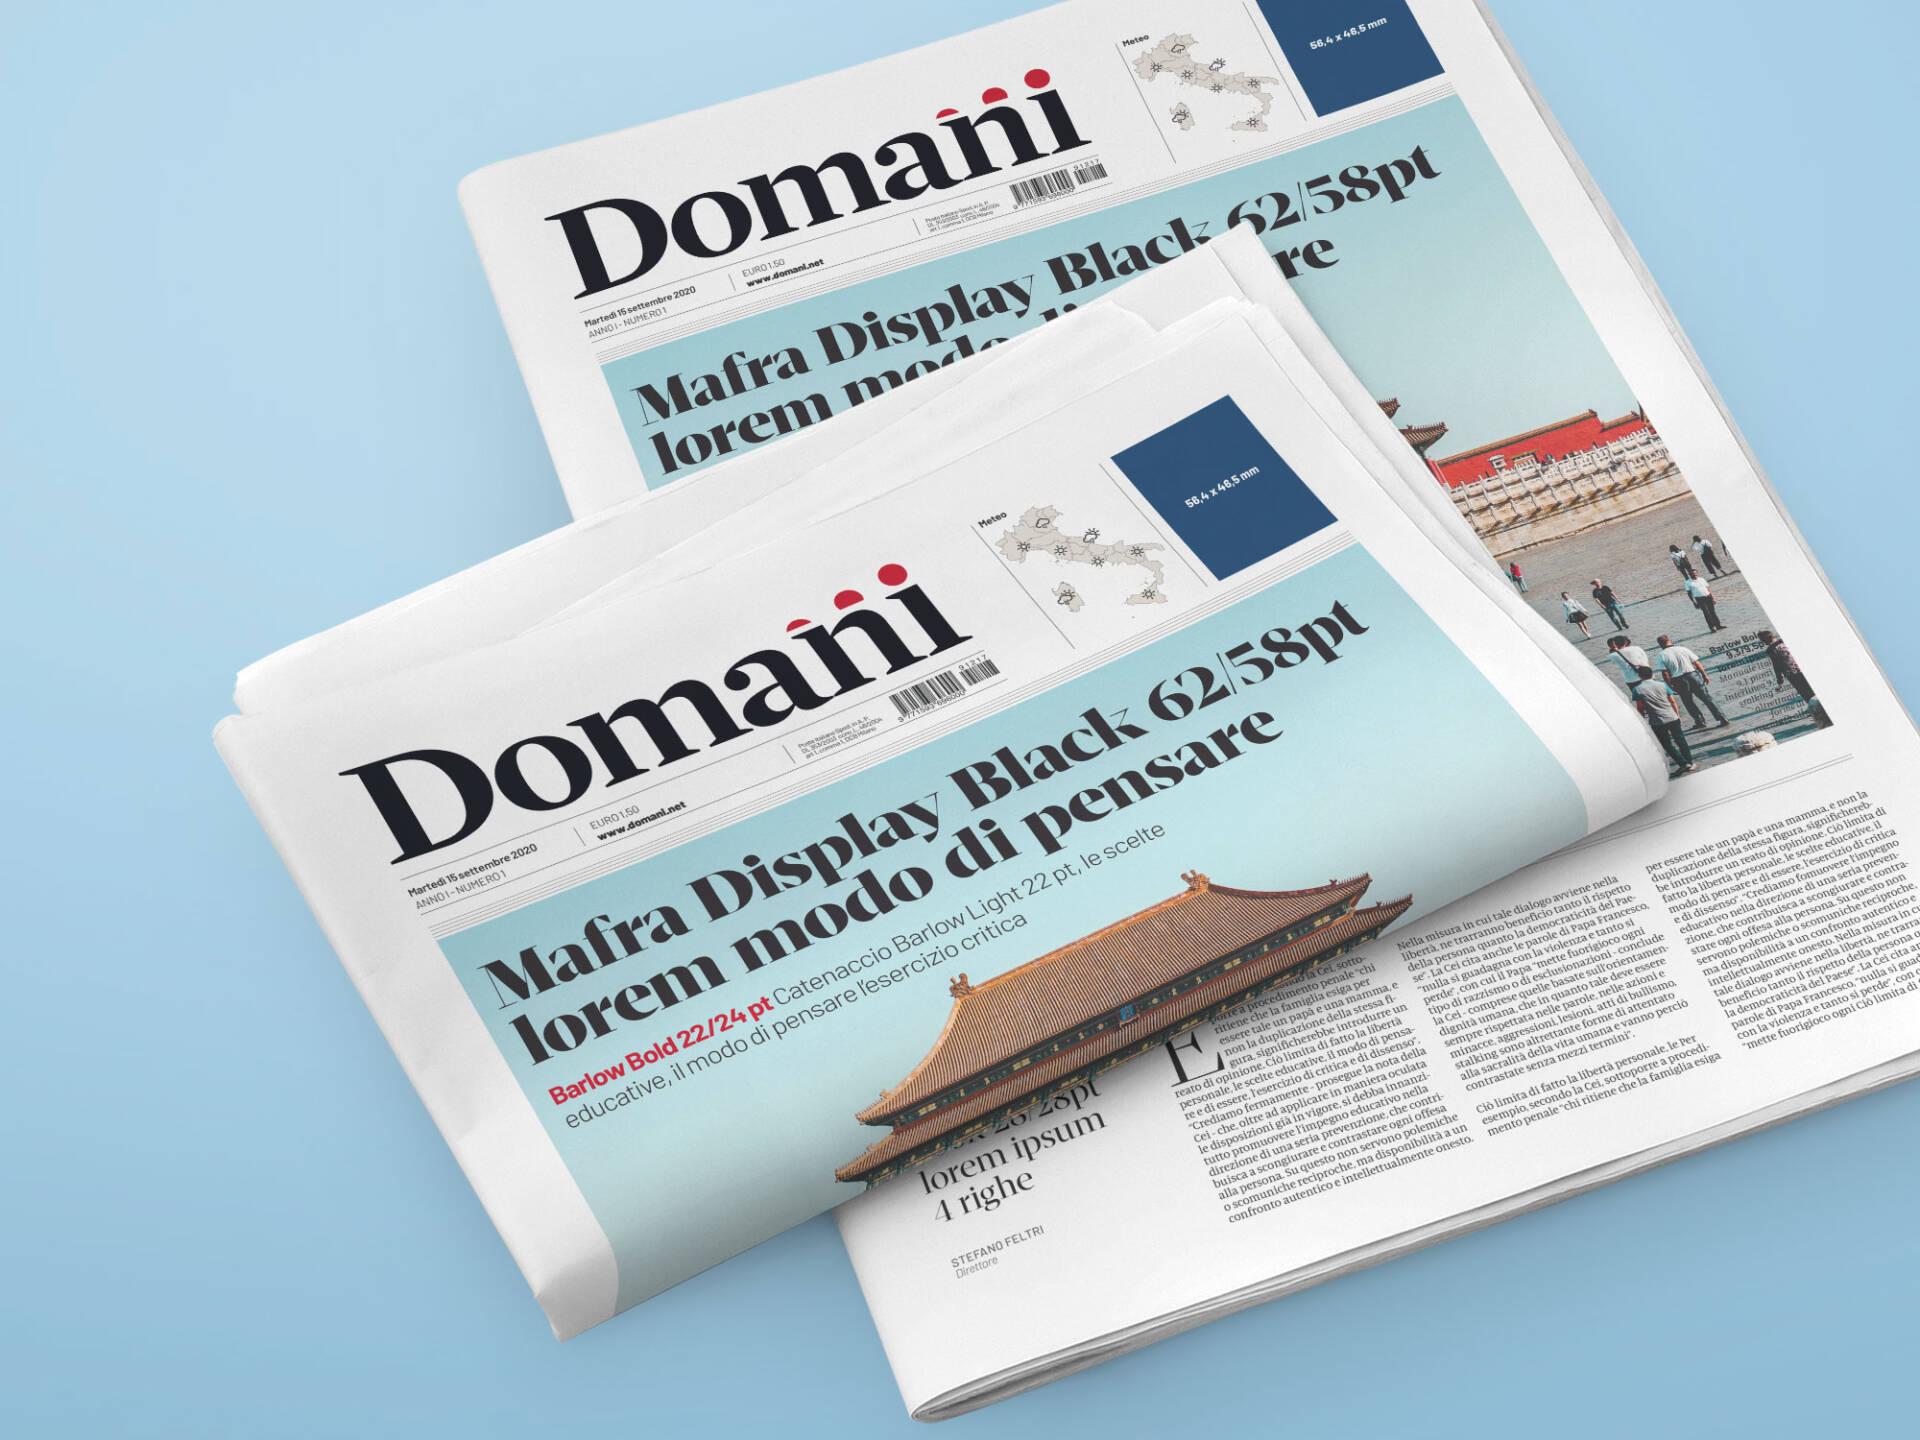 Domani_Print_Frontpage_Wenceslau_News_Design10